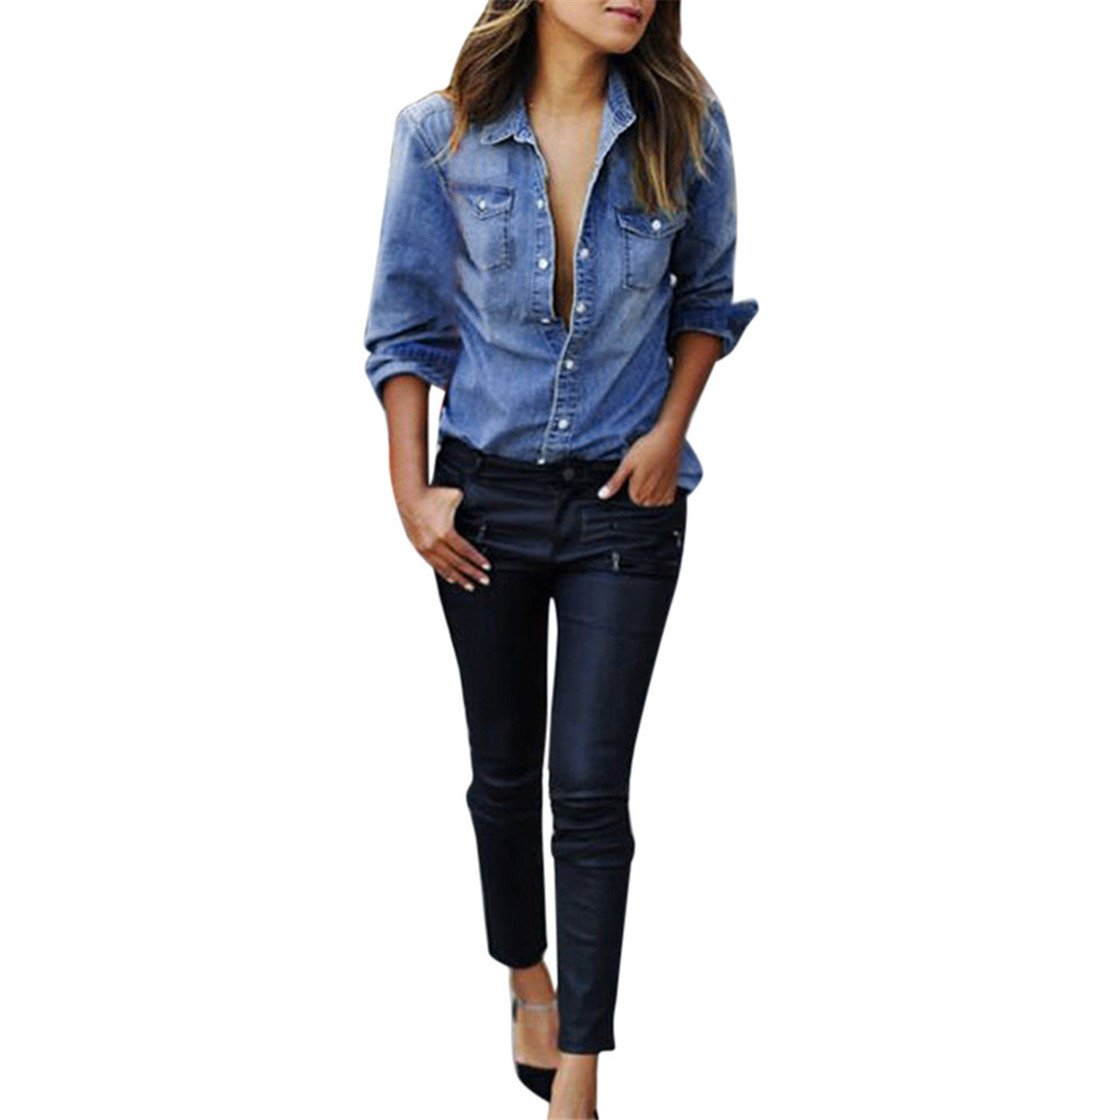 Mose Women's Tops, Women Fashion Womens Casual Blue Jean Denim Long Sleeve Shirt Tops Blouse Comfortable New Elegant Daily Jacket Hot (L3, Blue)